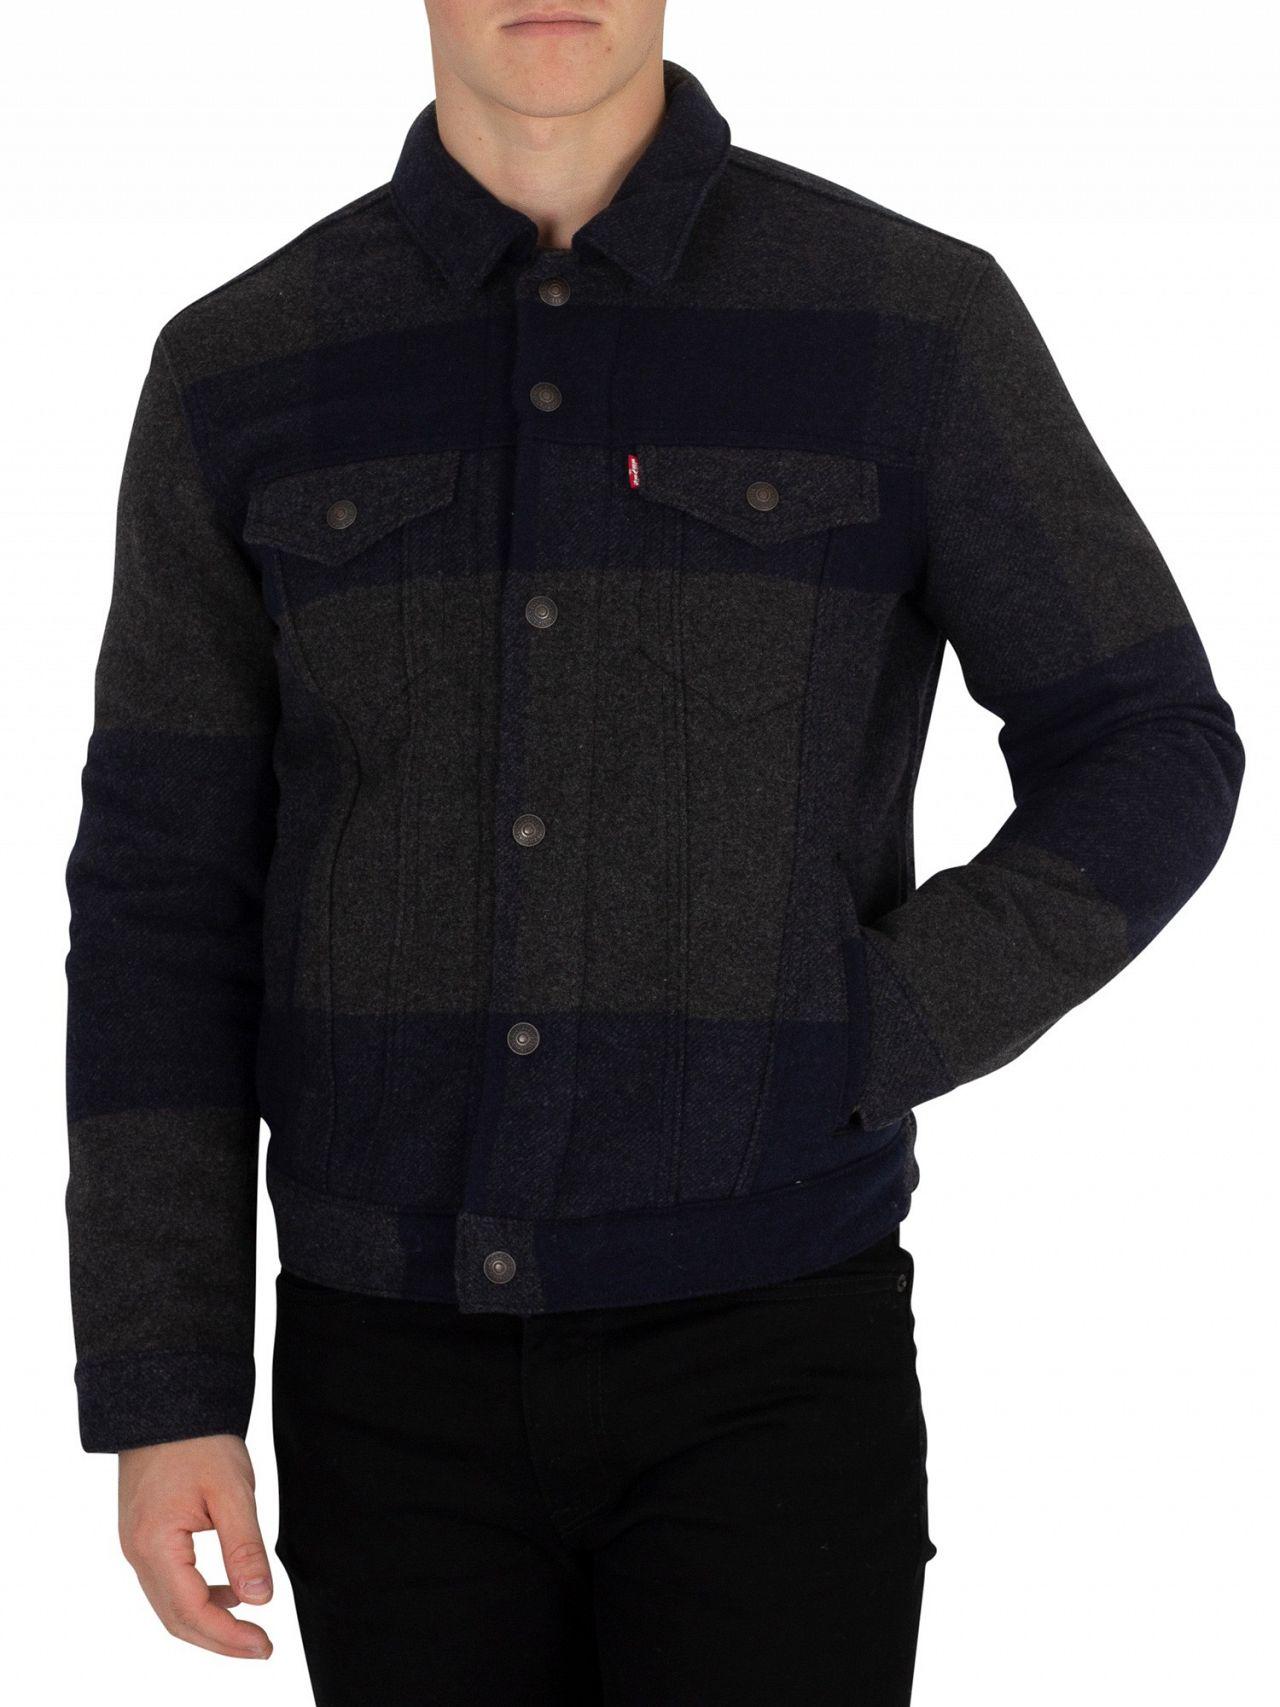 Gelada Jacket Trucker Original Levi's Wool qdYxC